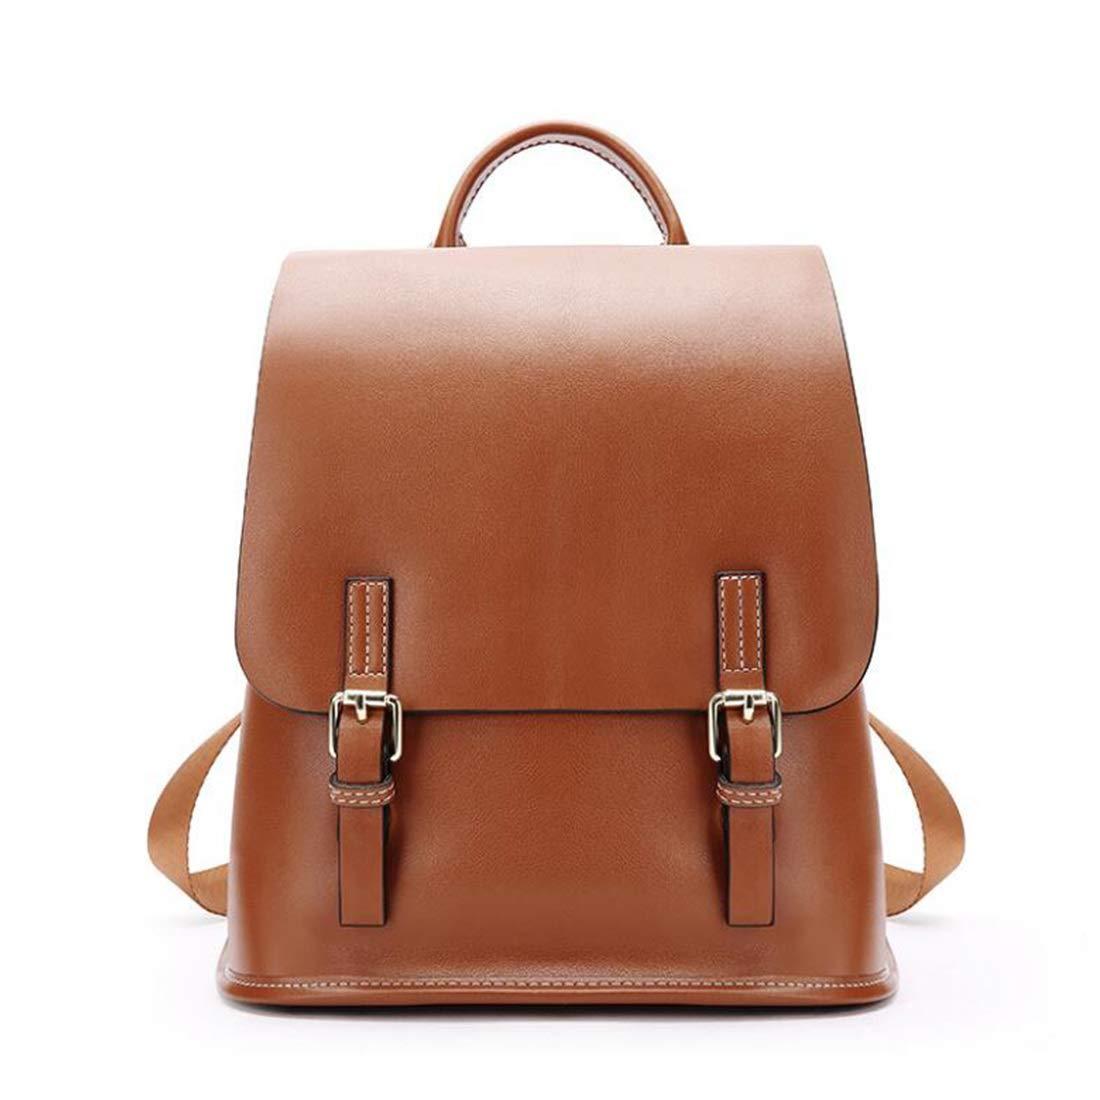 WEATLY WEATLY WEATLY Damen Leder Rucksack Casual Rucksäcke Daypack für Damen Reise Schule (Farbe   schwarz) B07MTVY45F Daypacks Viele Stile 08fd83